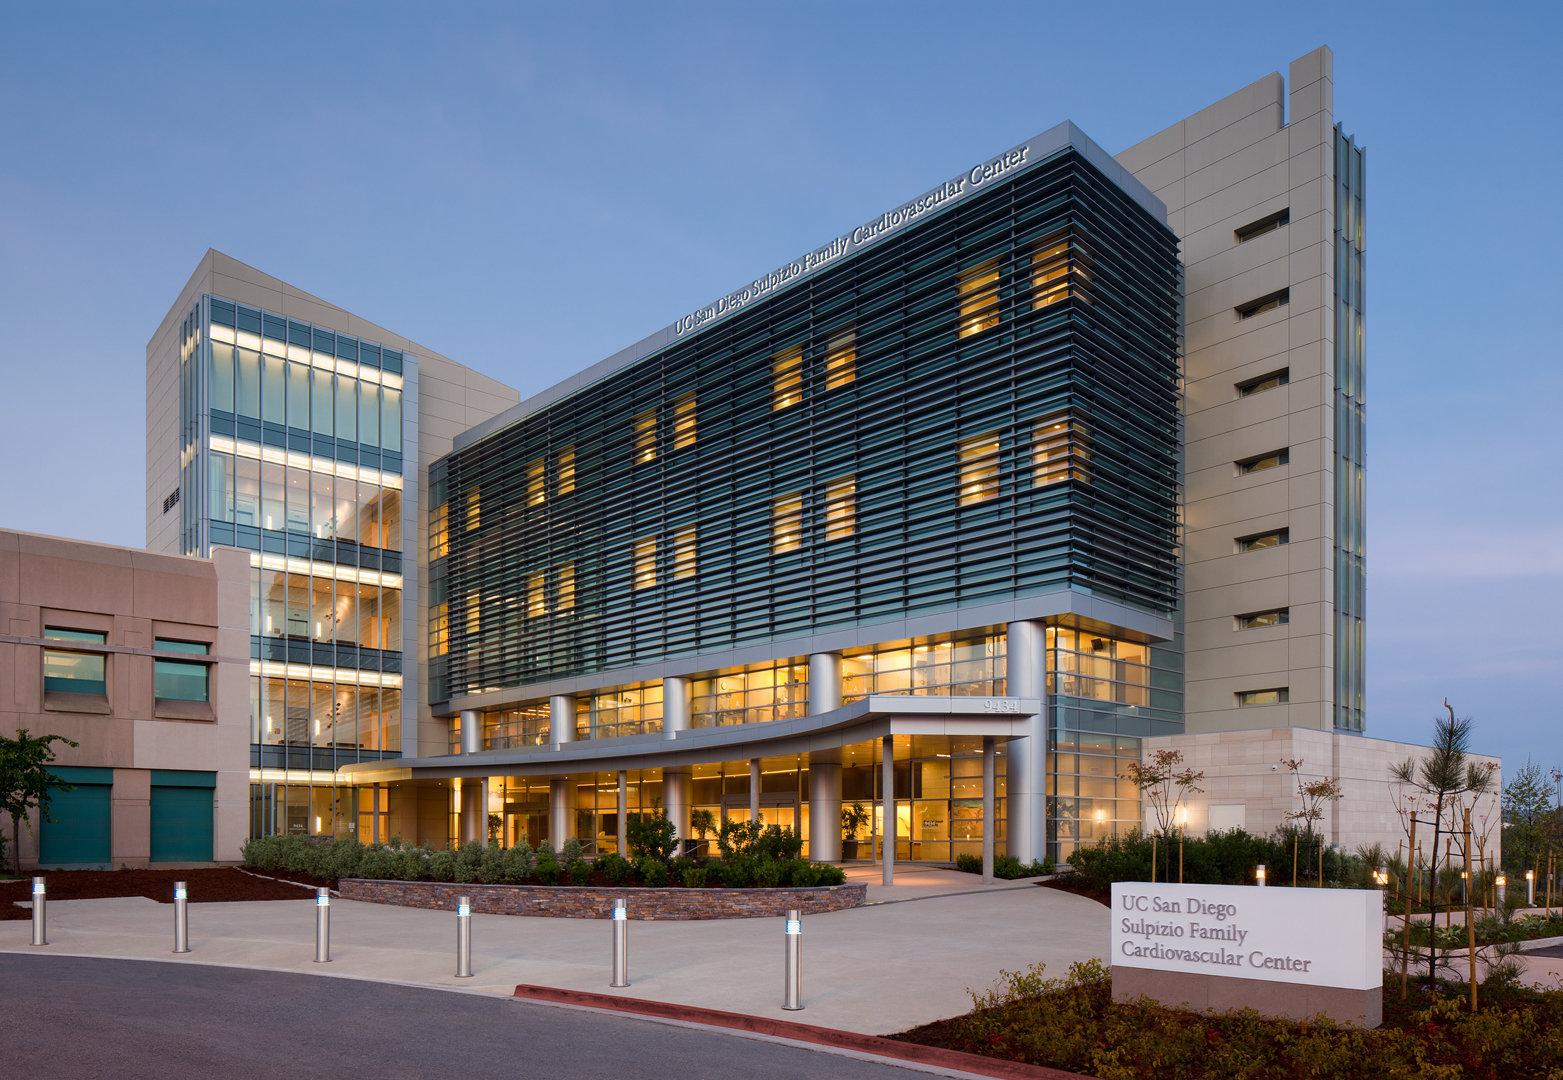 UCSD Sulpizio Cardiovascular Center